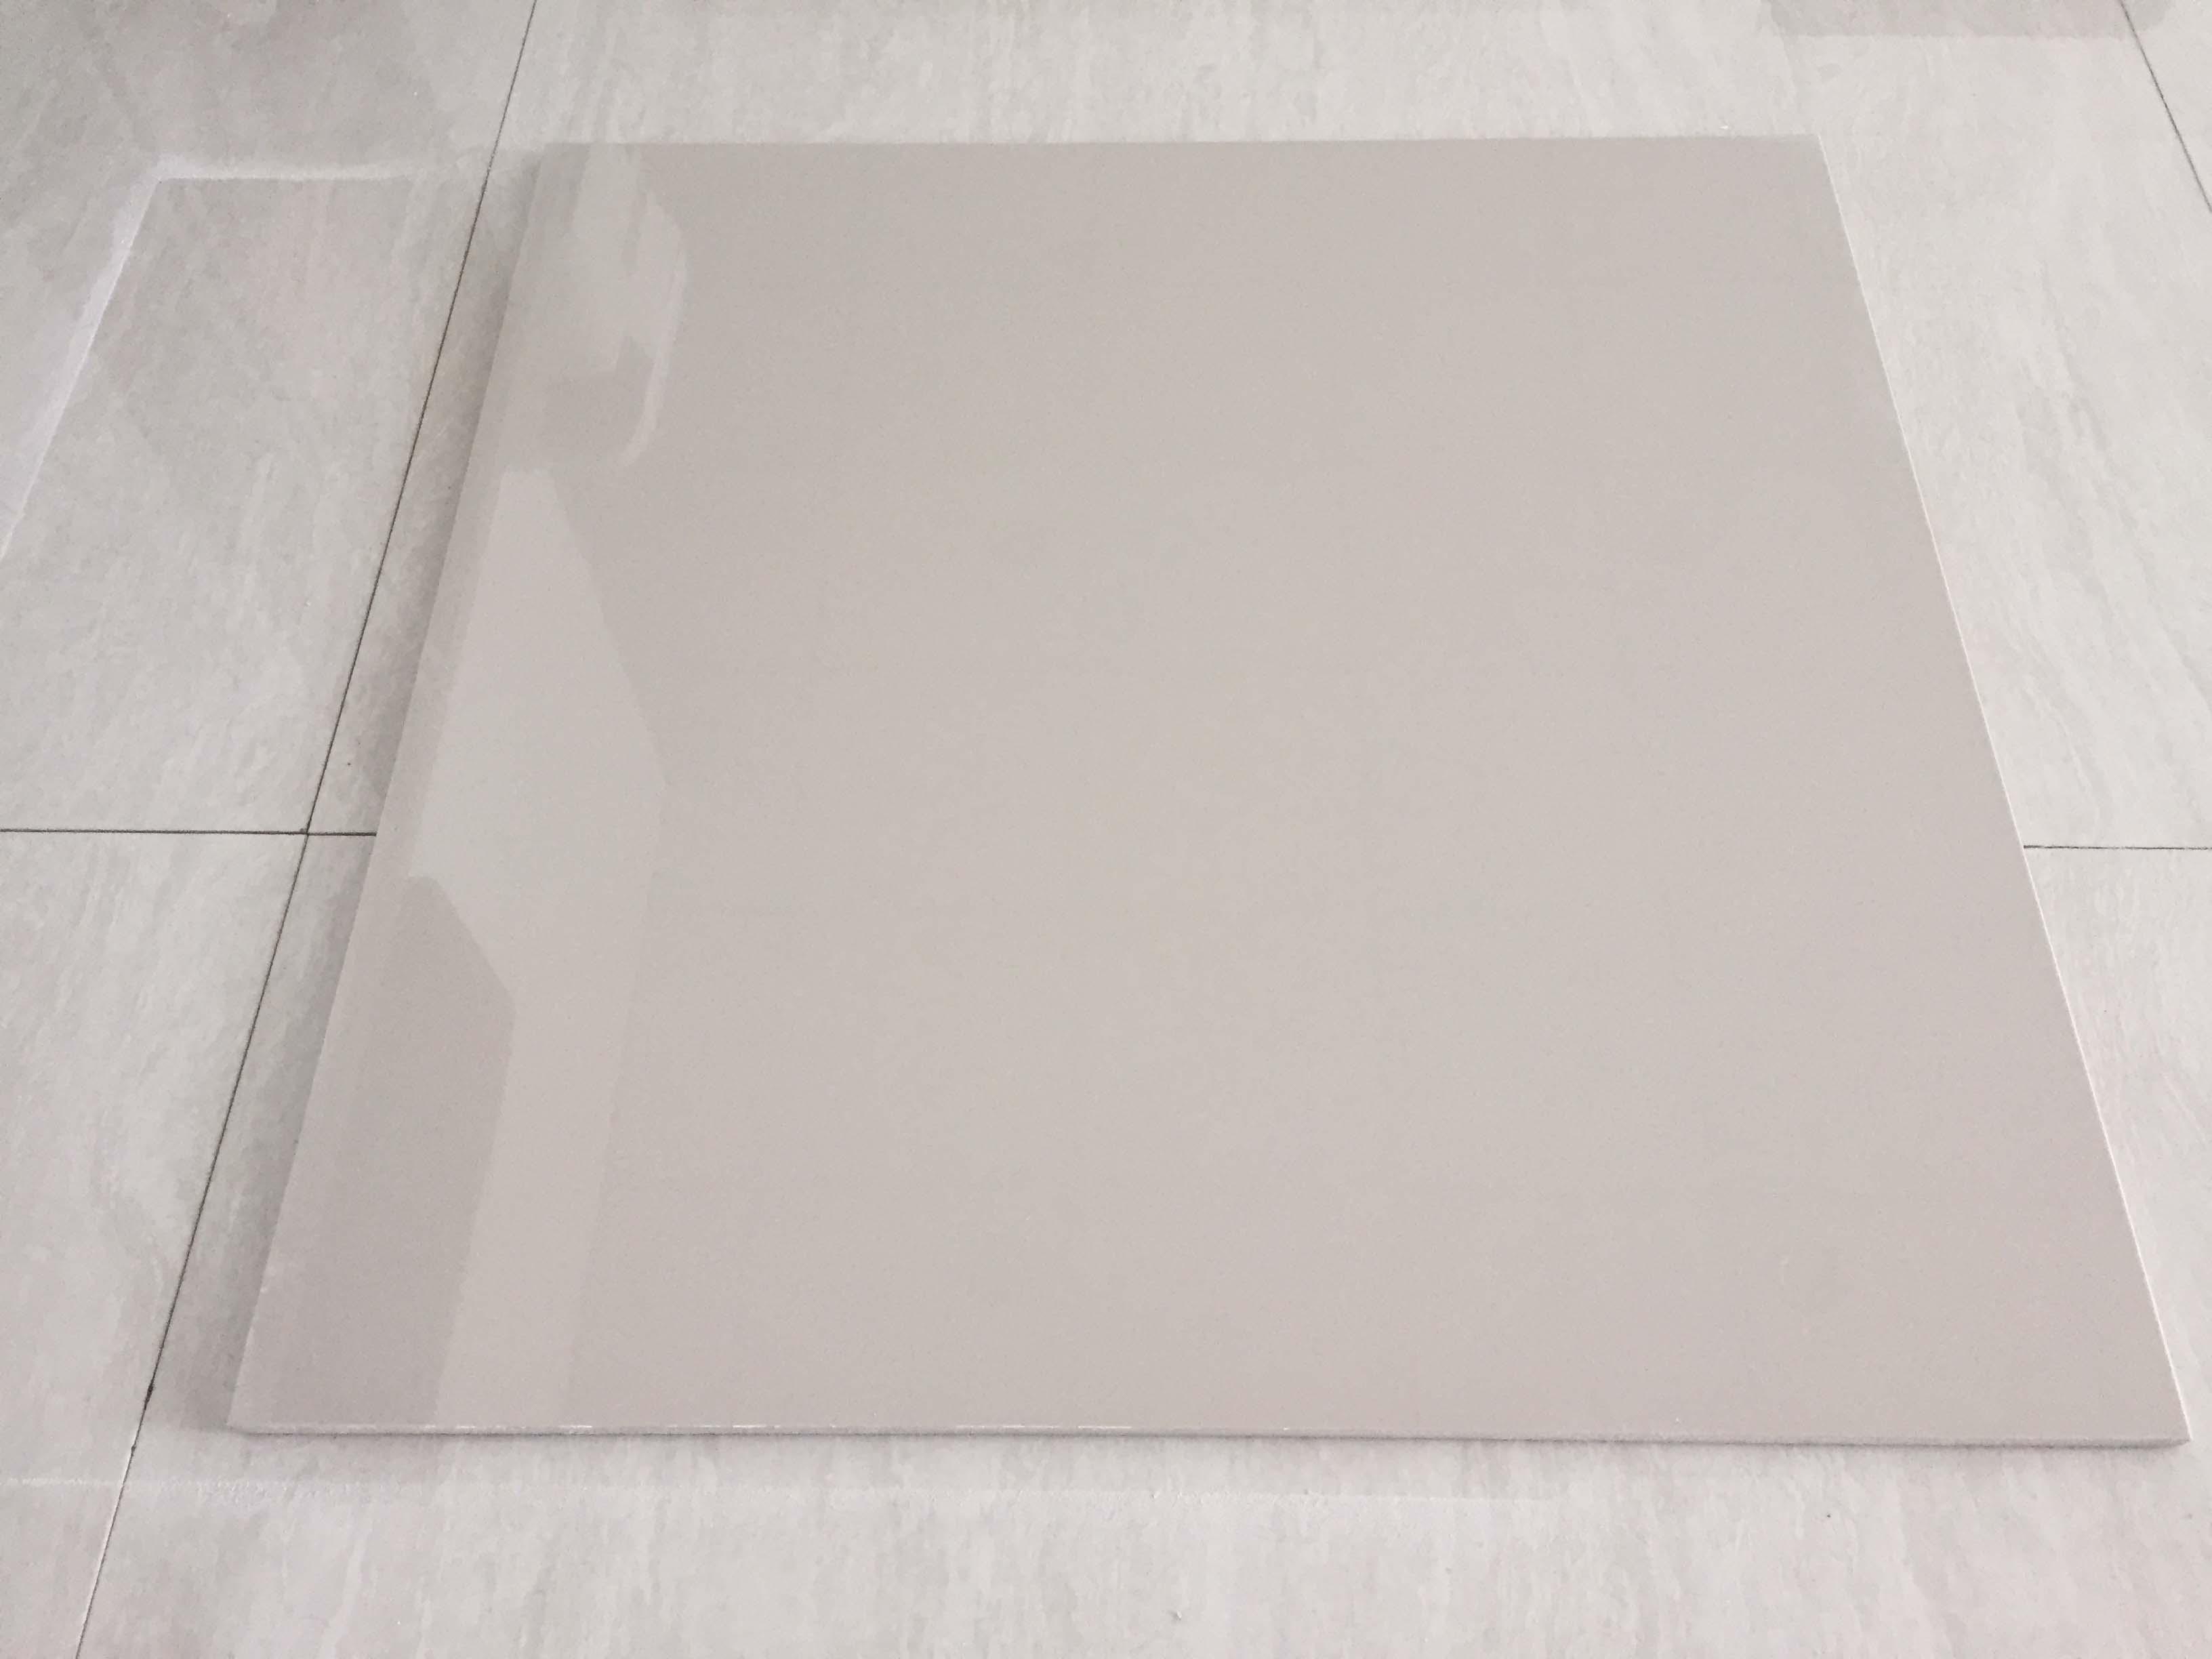 Sale $3.3 Promotion Foshan Ceramic Ivory White Polished Porcelain Floor Tile (P600)